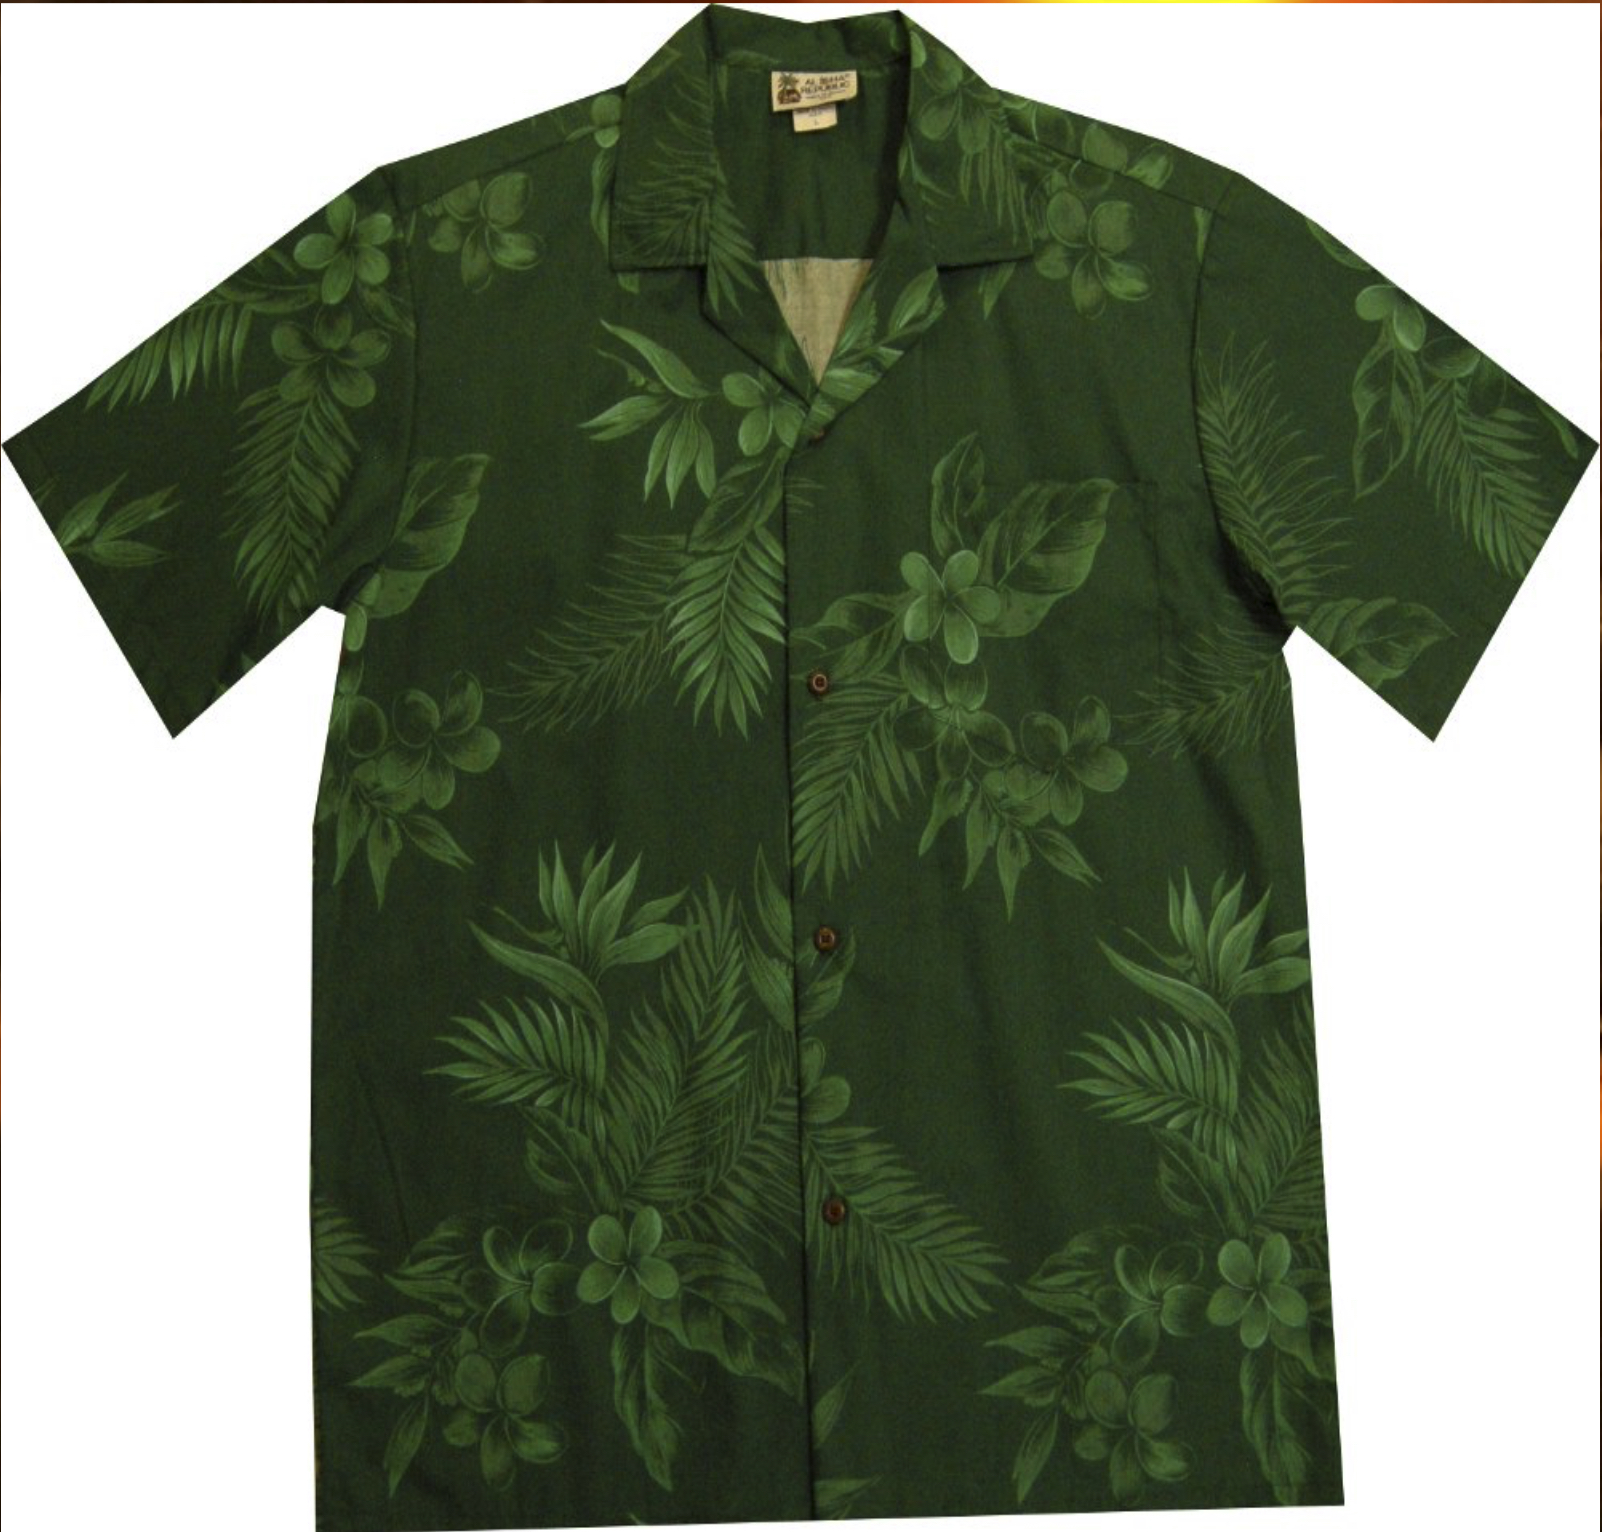 Green Floral Palm Leaf Hawaiian Shirt